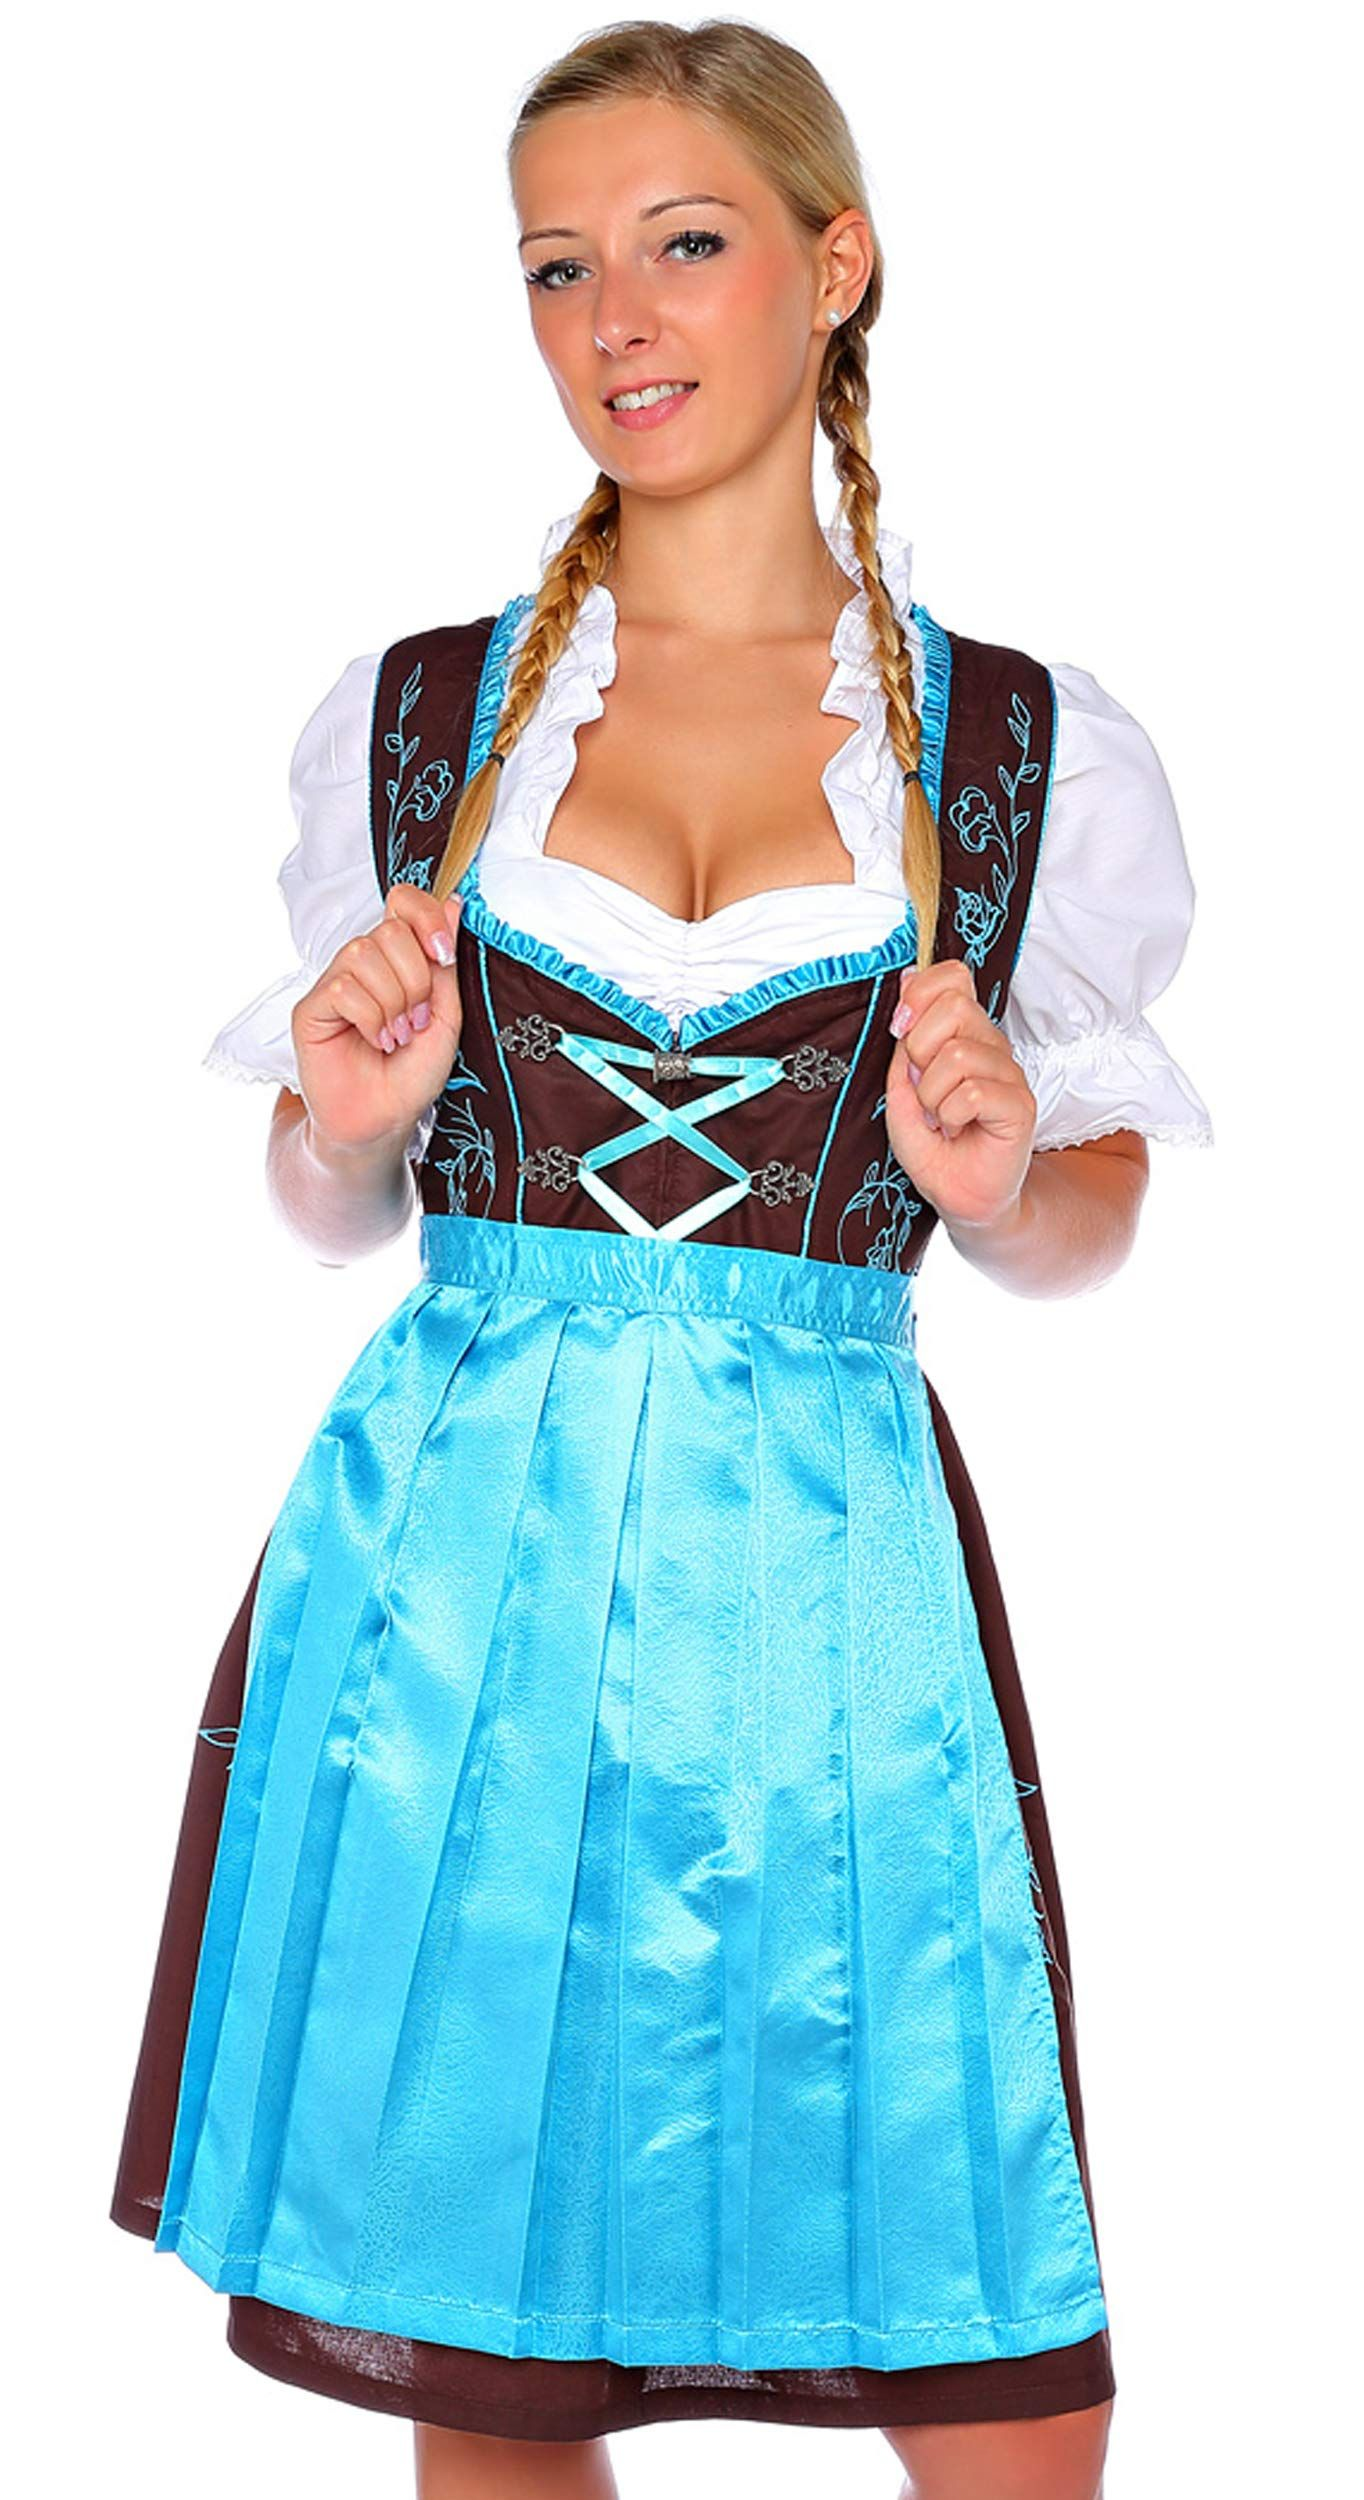 18047 Lukas Dirndl Authentic bavarian Trachten Dirndl dress 2-pieces with apron